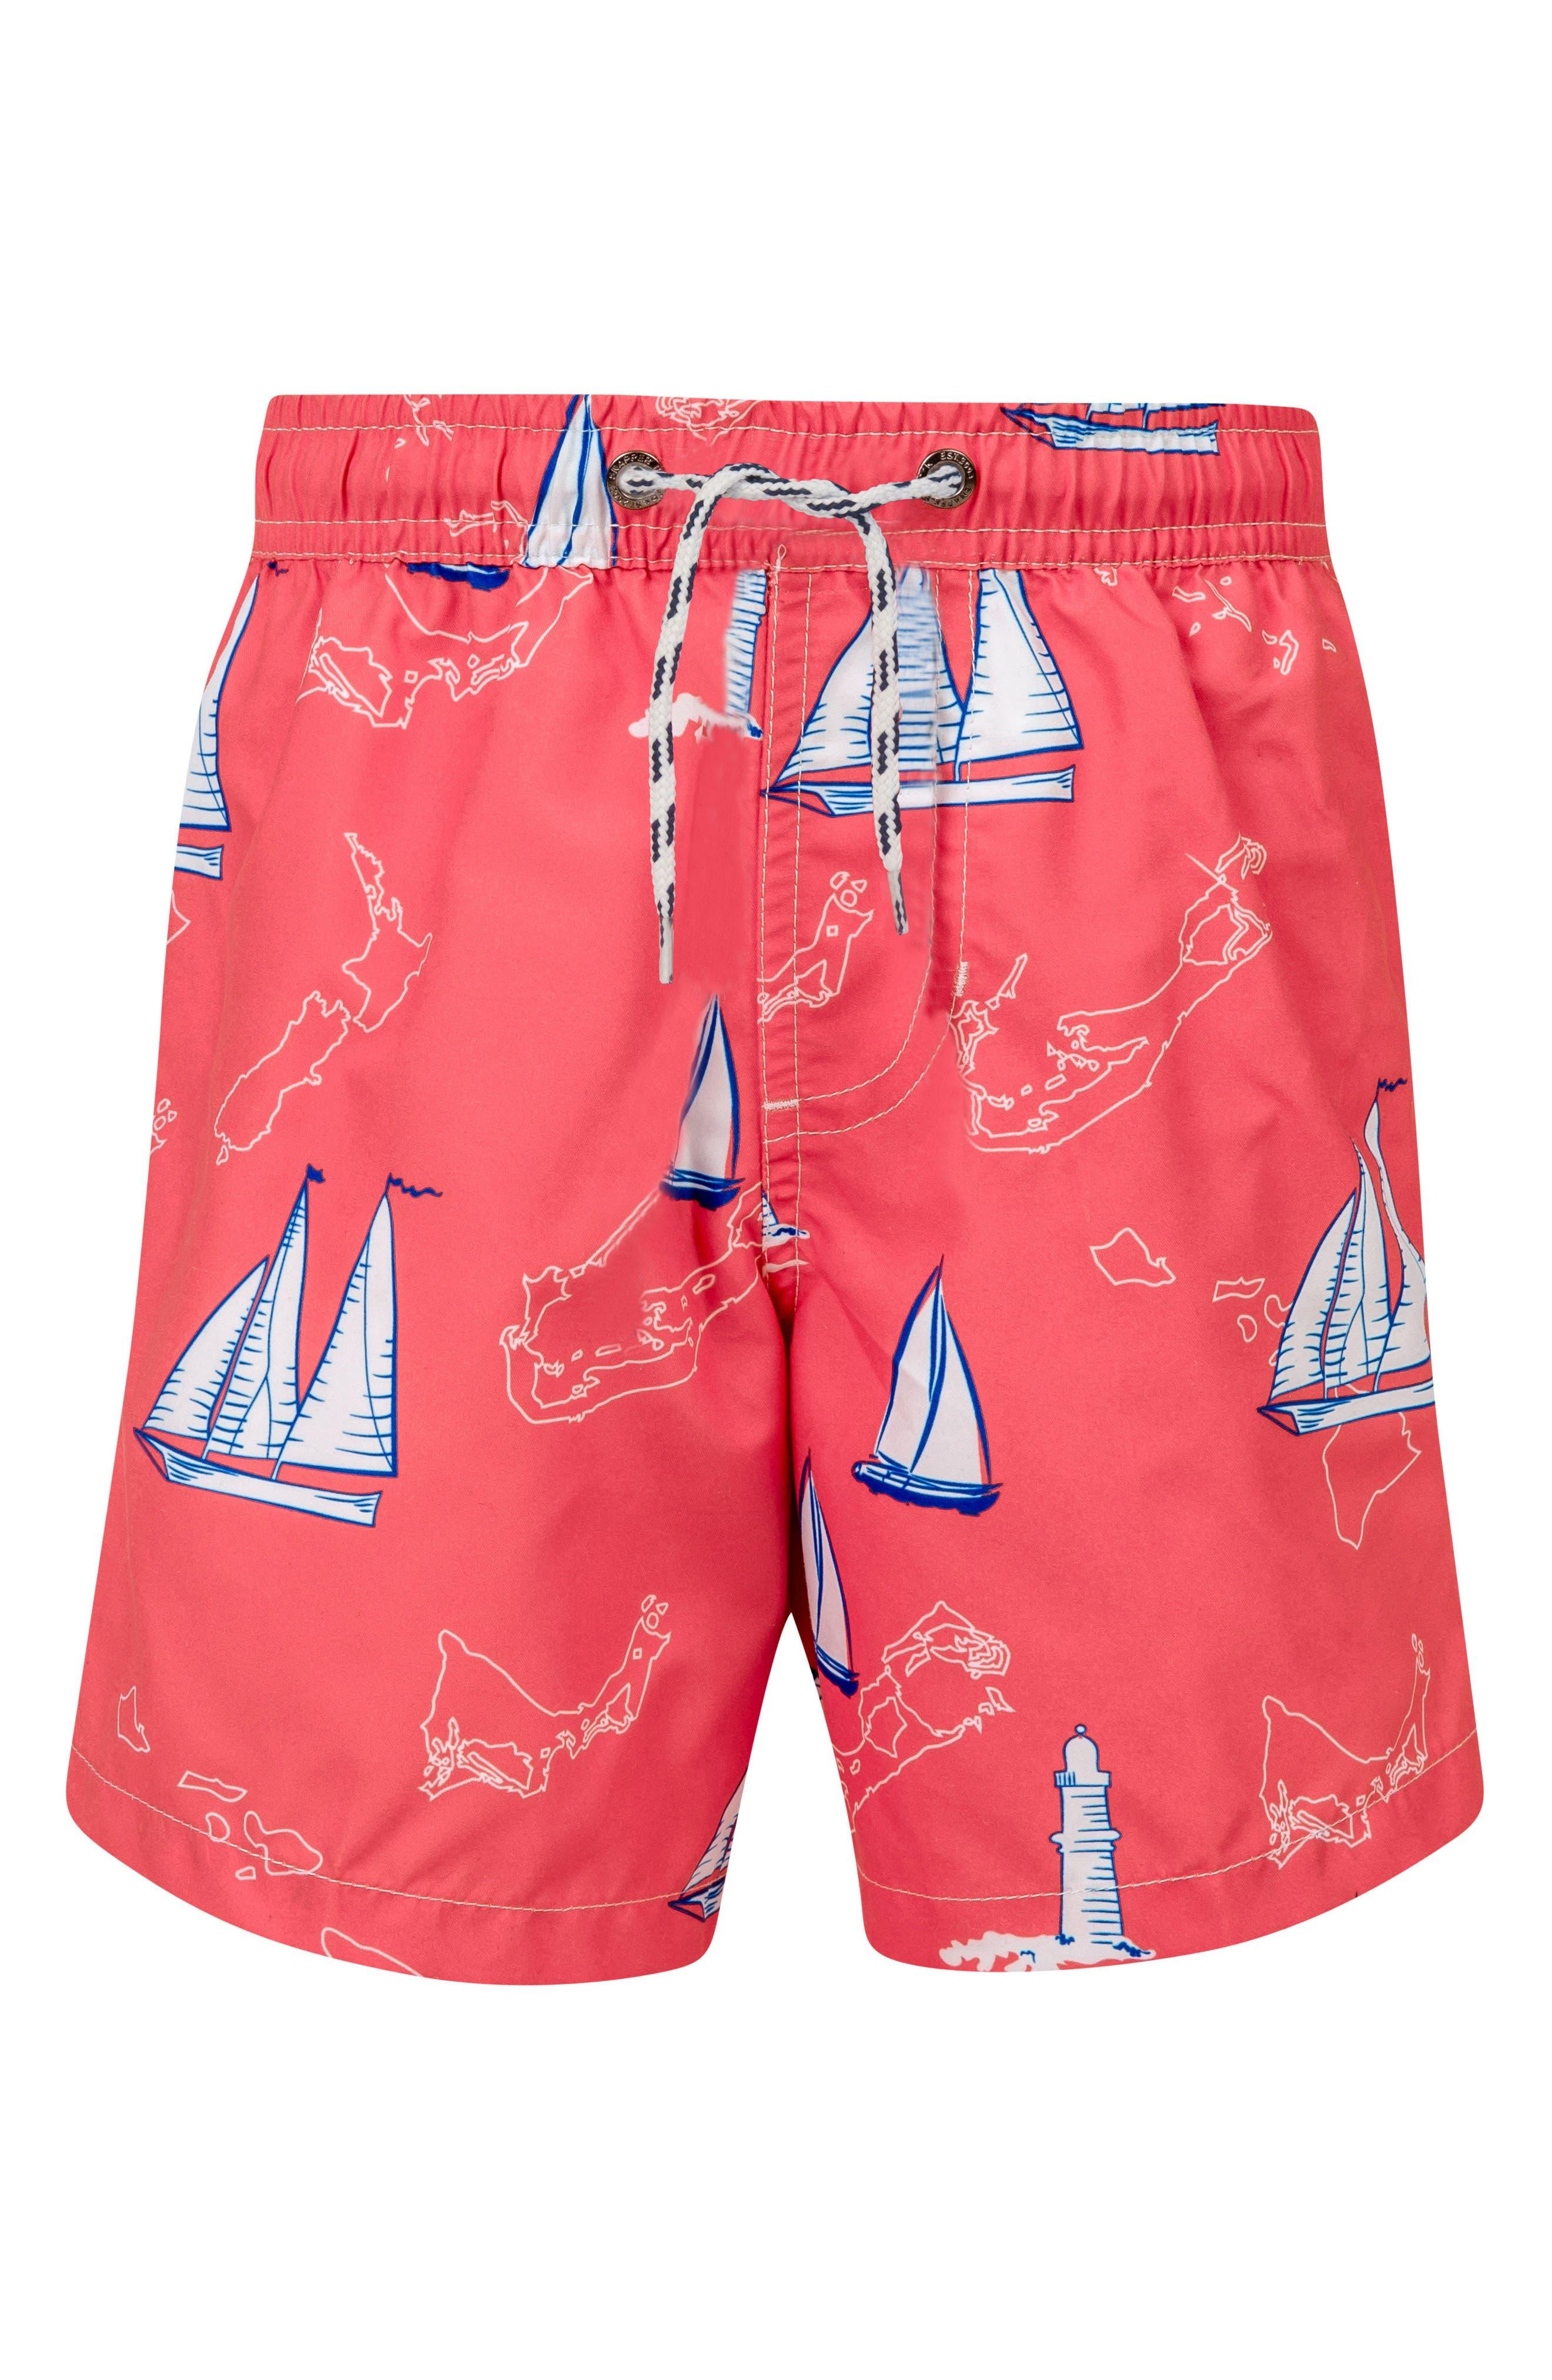 Alternate Image 1 Selected - Snapper Rock Island Sail Board Shorts (Big Boys)